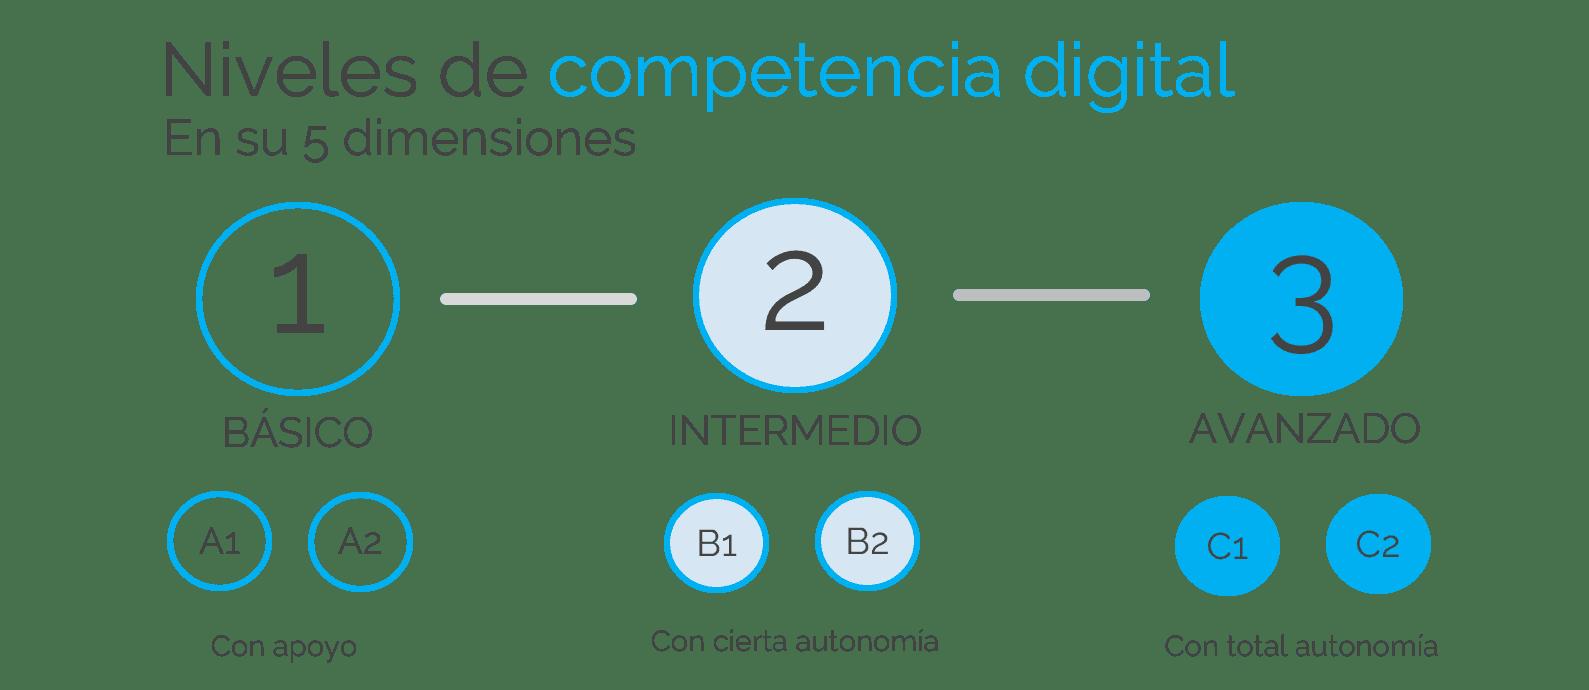 niveles de competencia digital docente